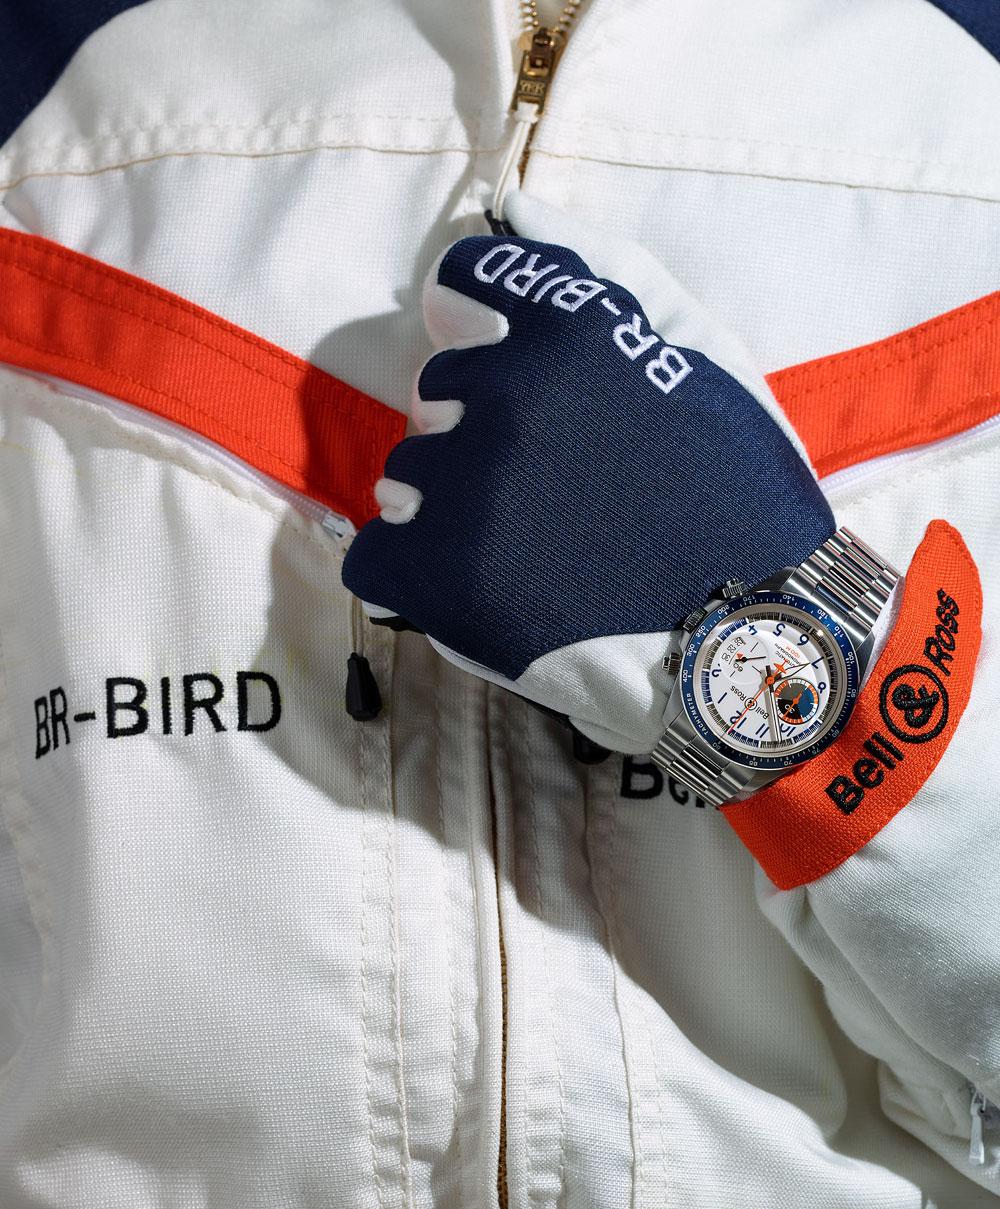 Reloj BR V2-94 RACING BIRD de Bell & Ross en edición limitada